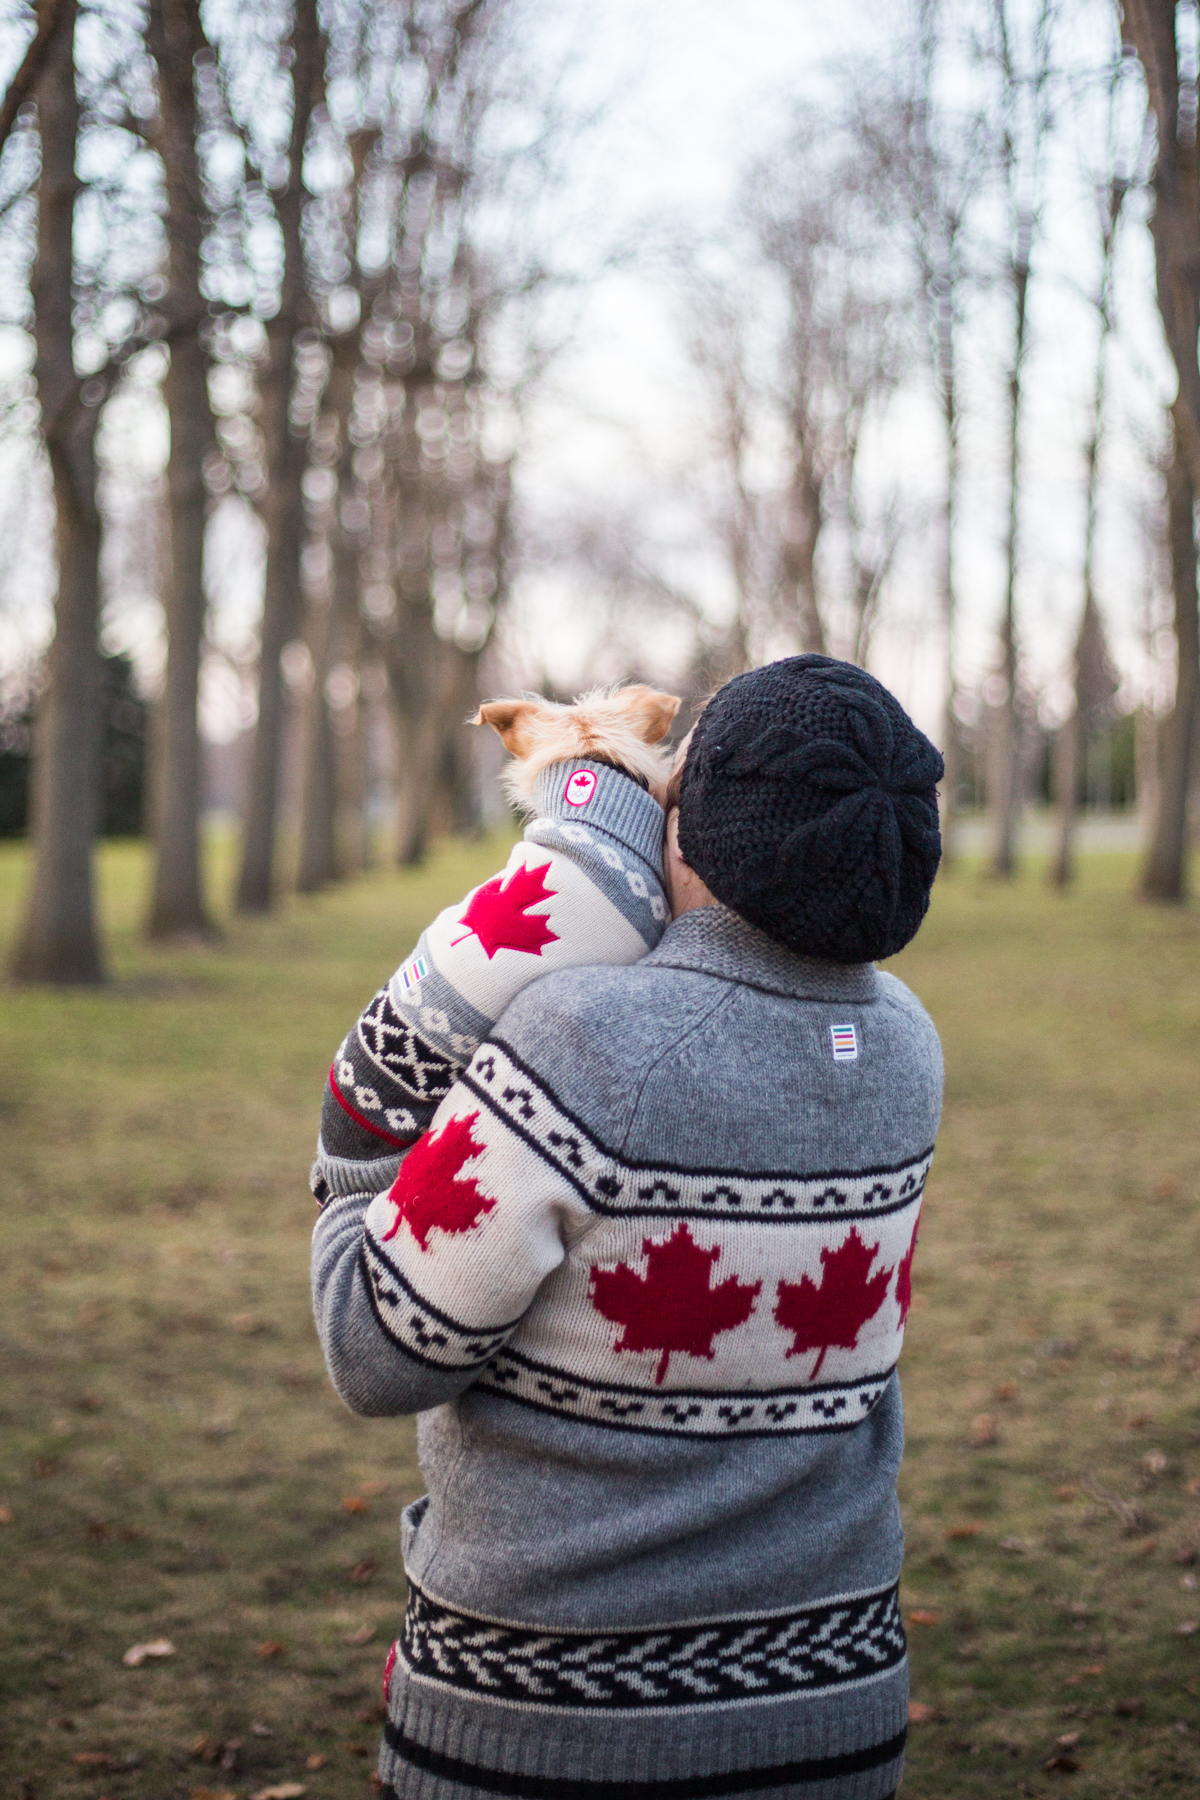 Toronto_Ontario_Tatamagoche_Nova-Scotia_-Bolandia-1502.jpg